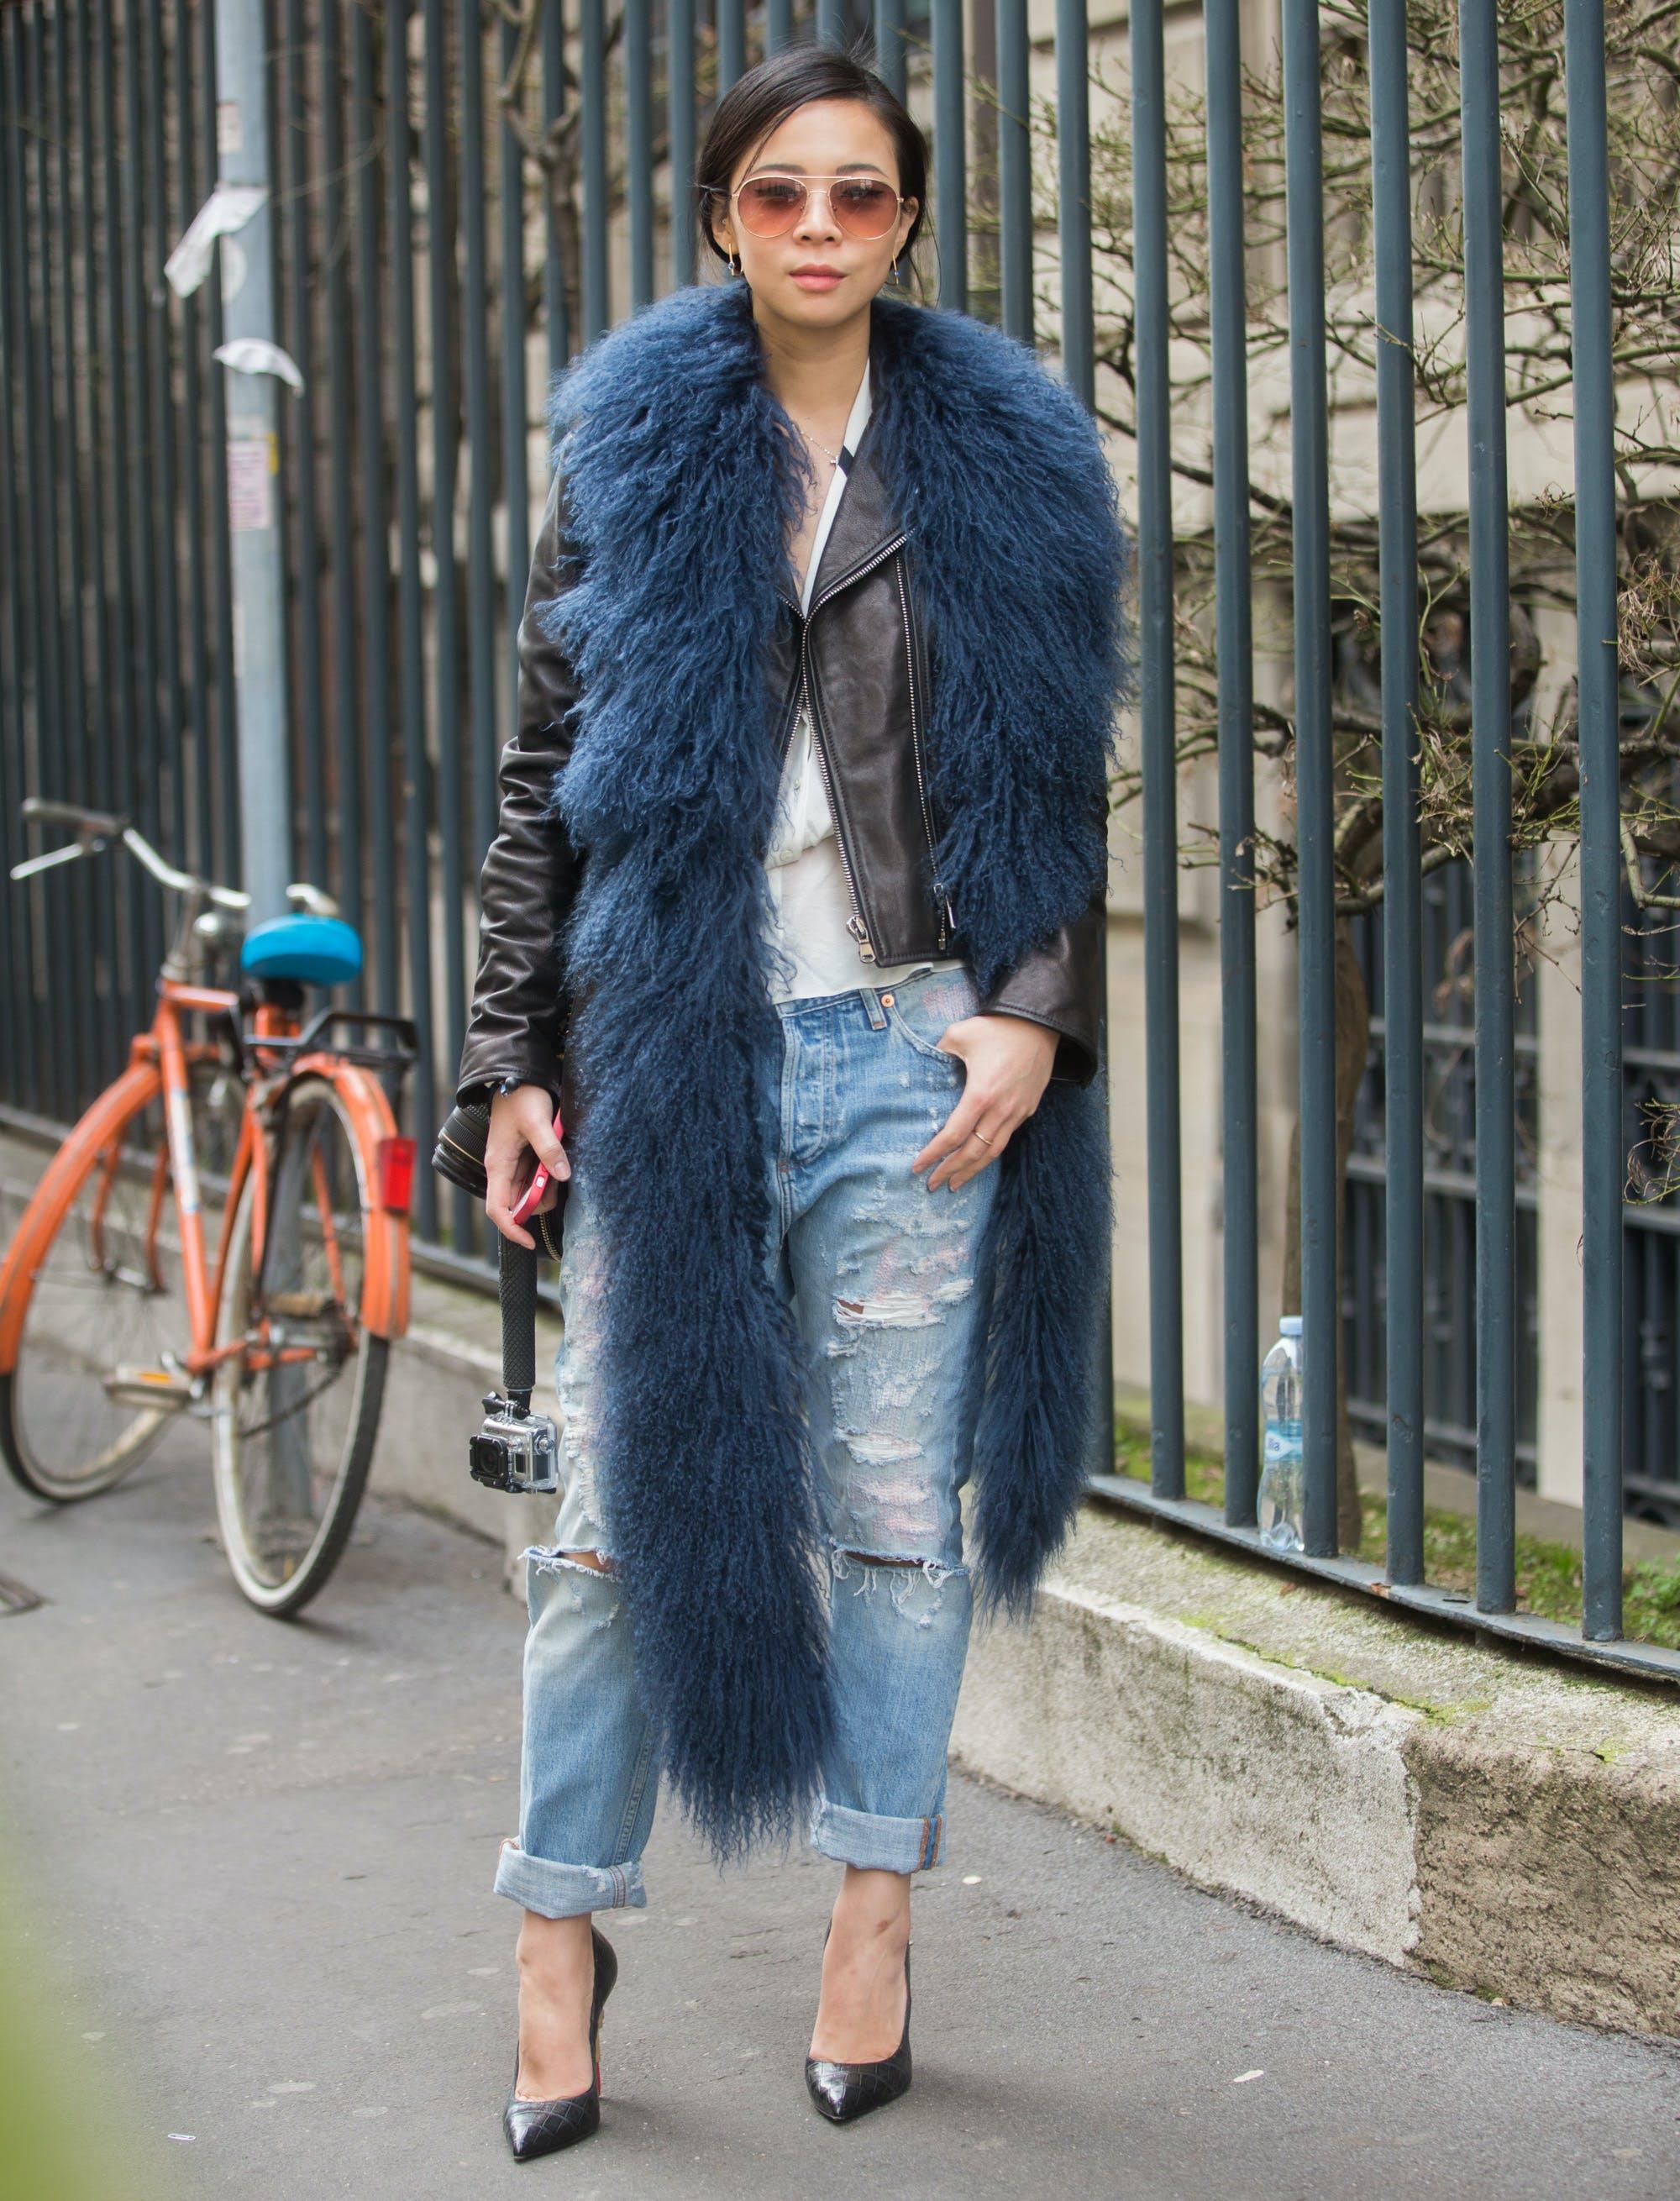 woman wearing a faux fur scarf